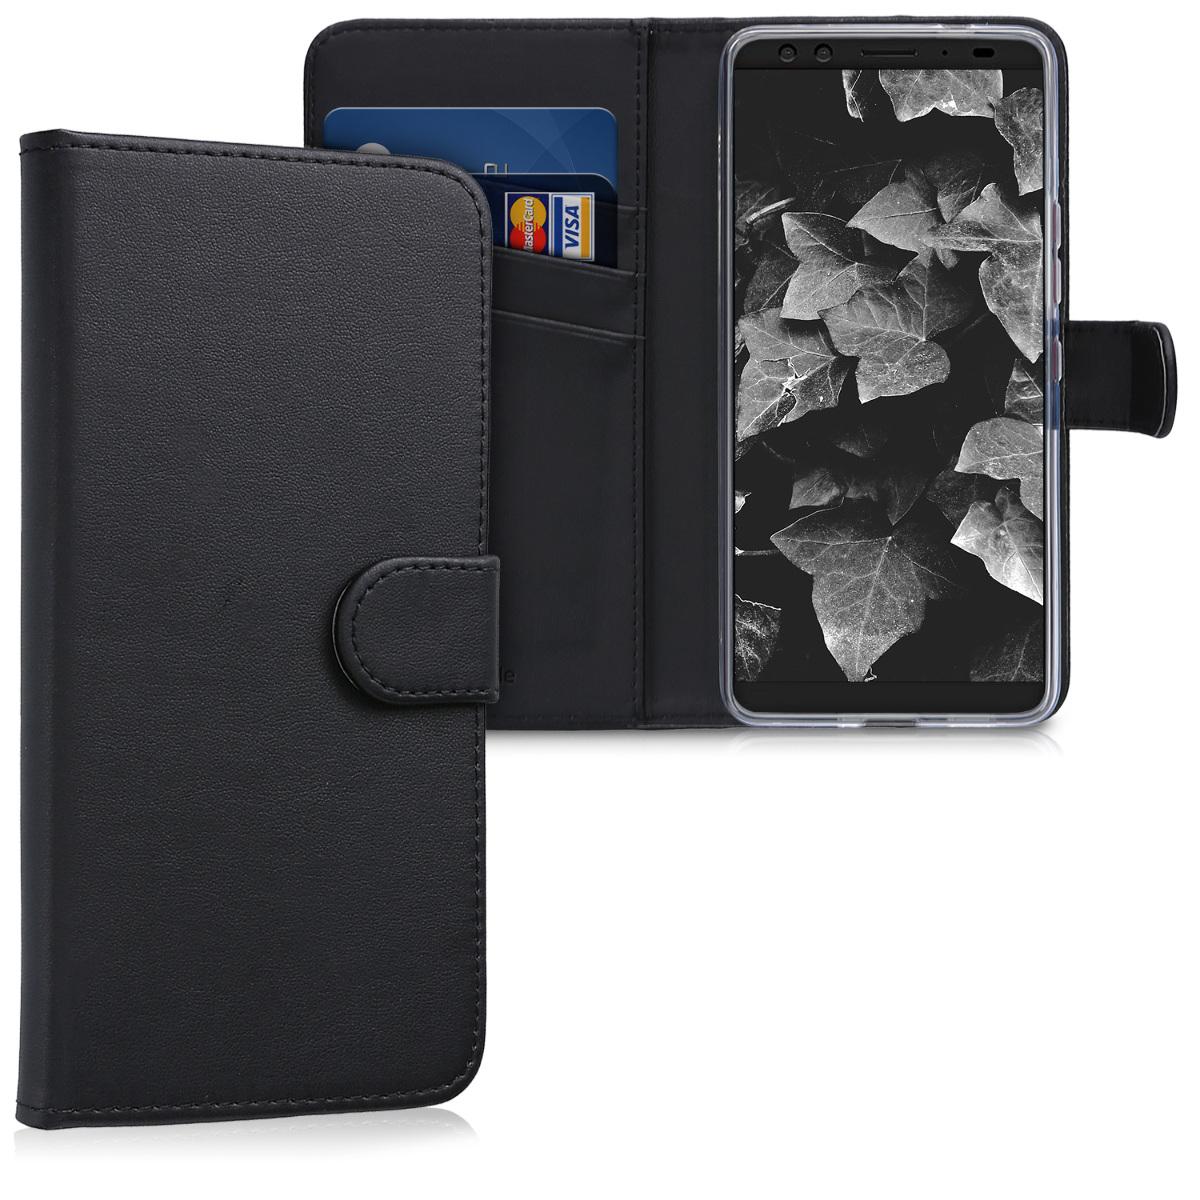 KW Θήκη-Πορτοφόλι HTC U12 Plus - Μαύρο (45269.01)